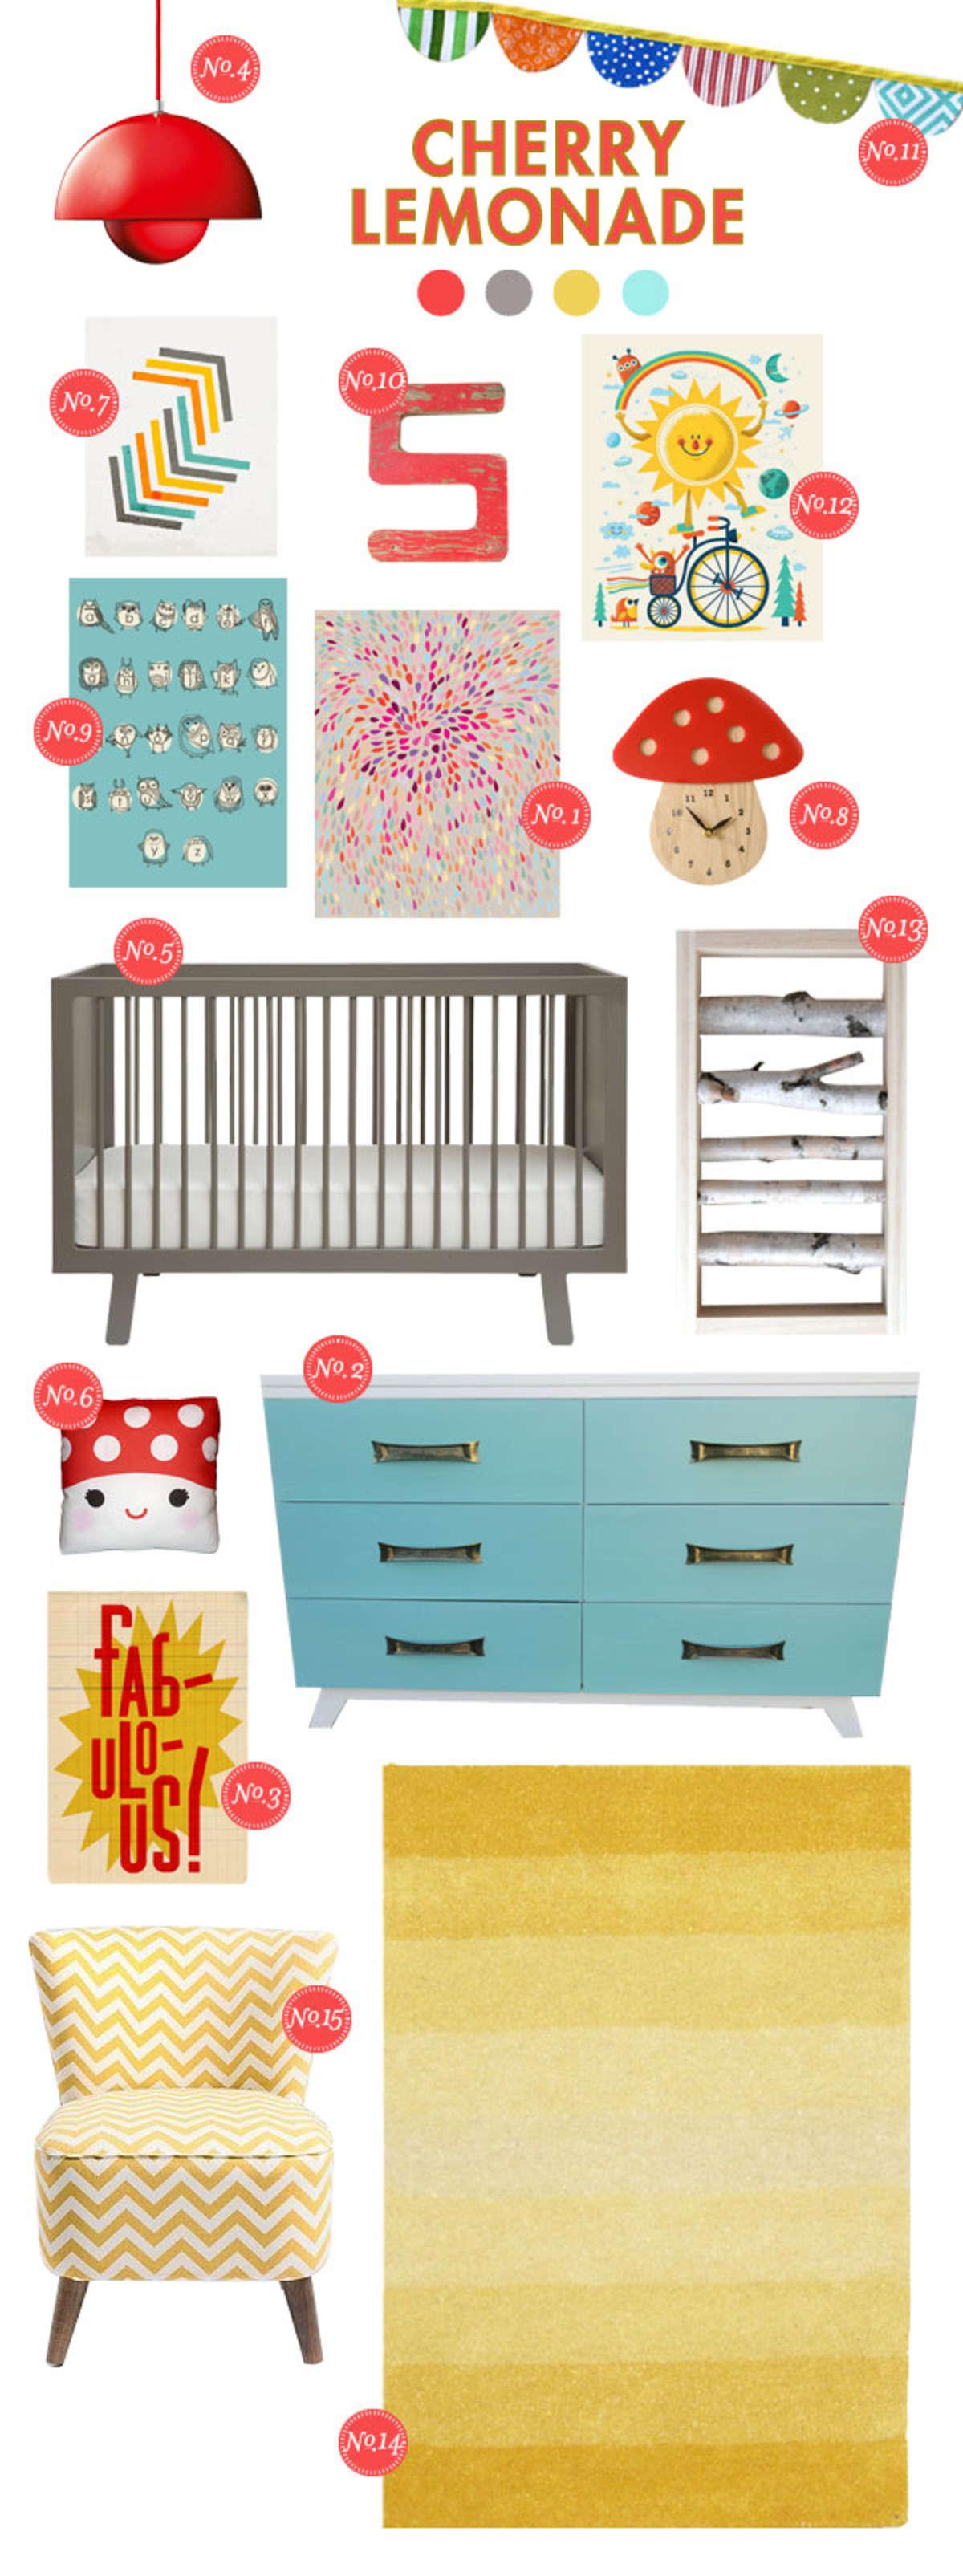 cherry lemonade bright baby room ideas